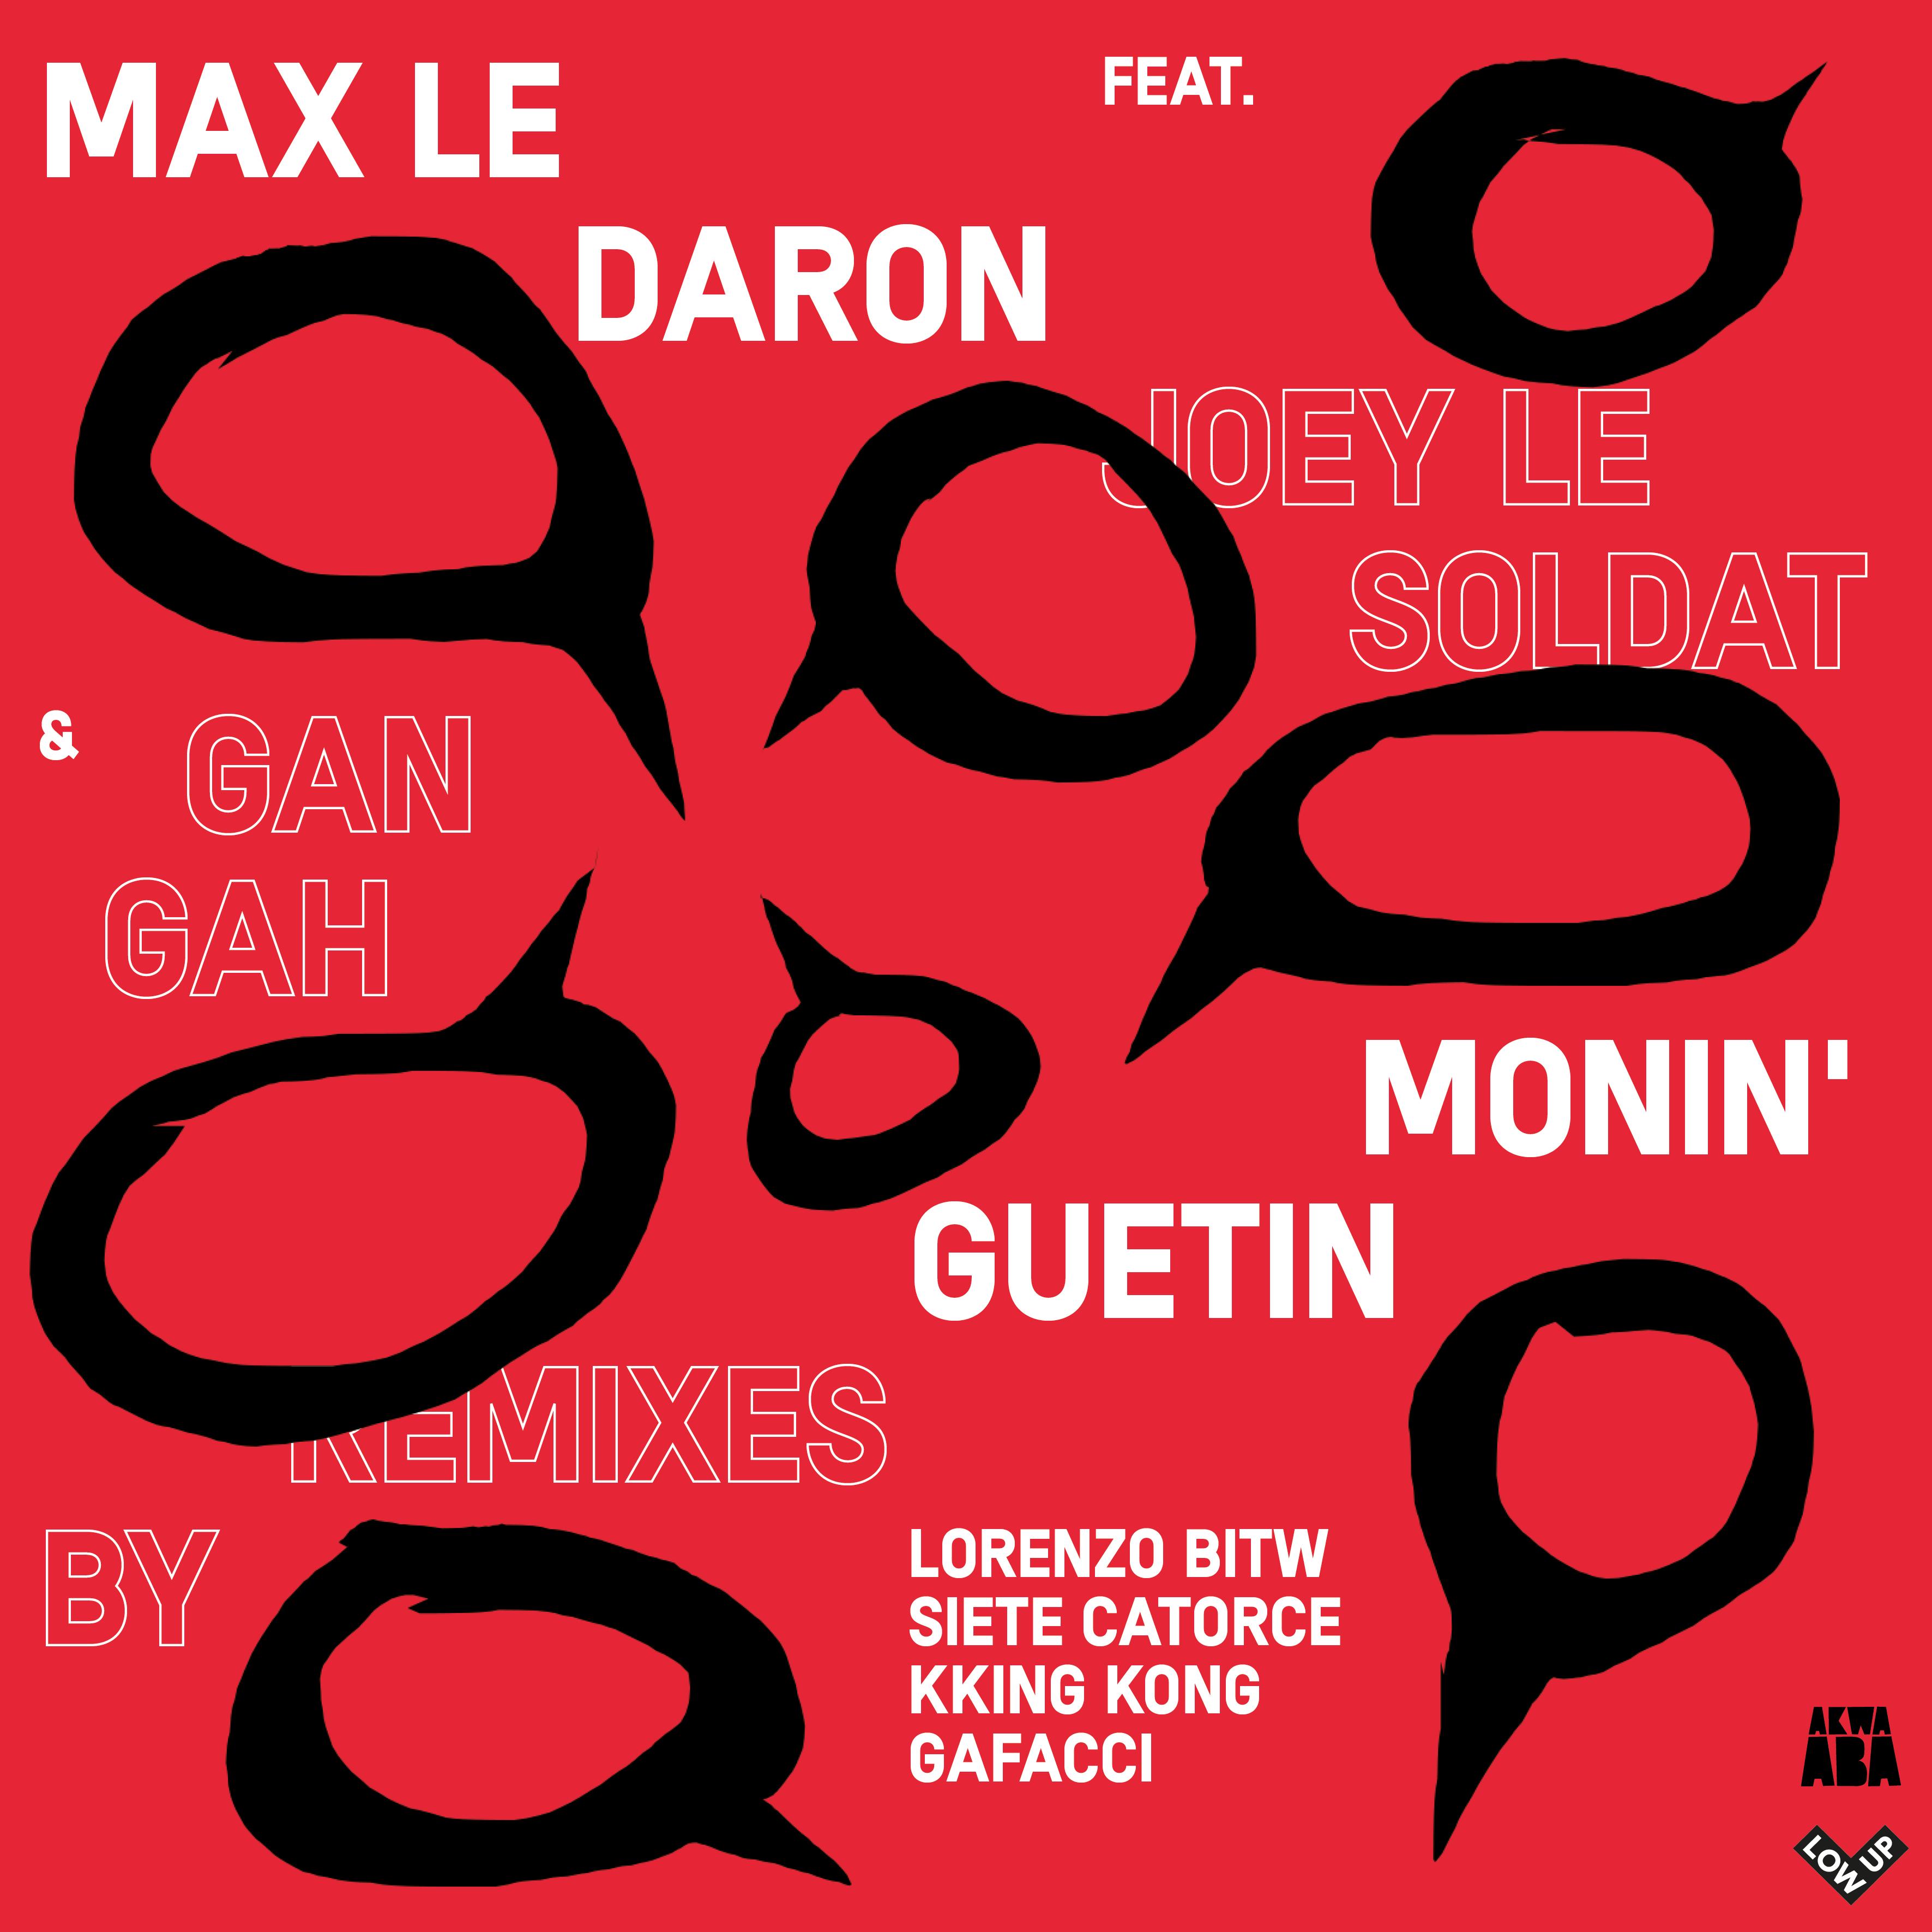 (LWP018) Max Le Daron – Monin'Guetin Remix EP